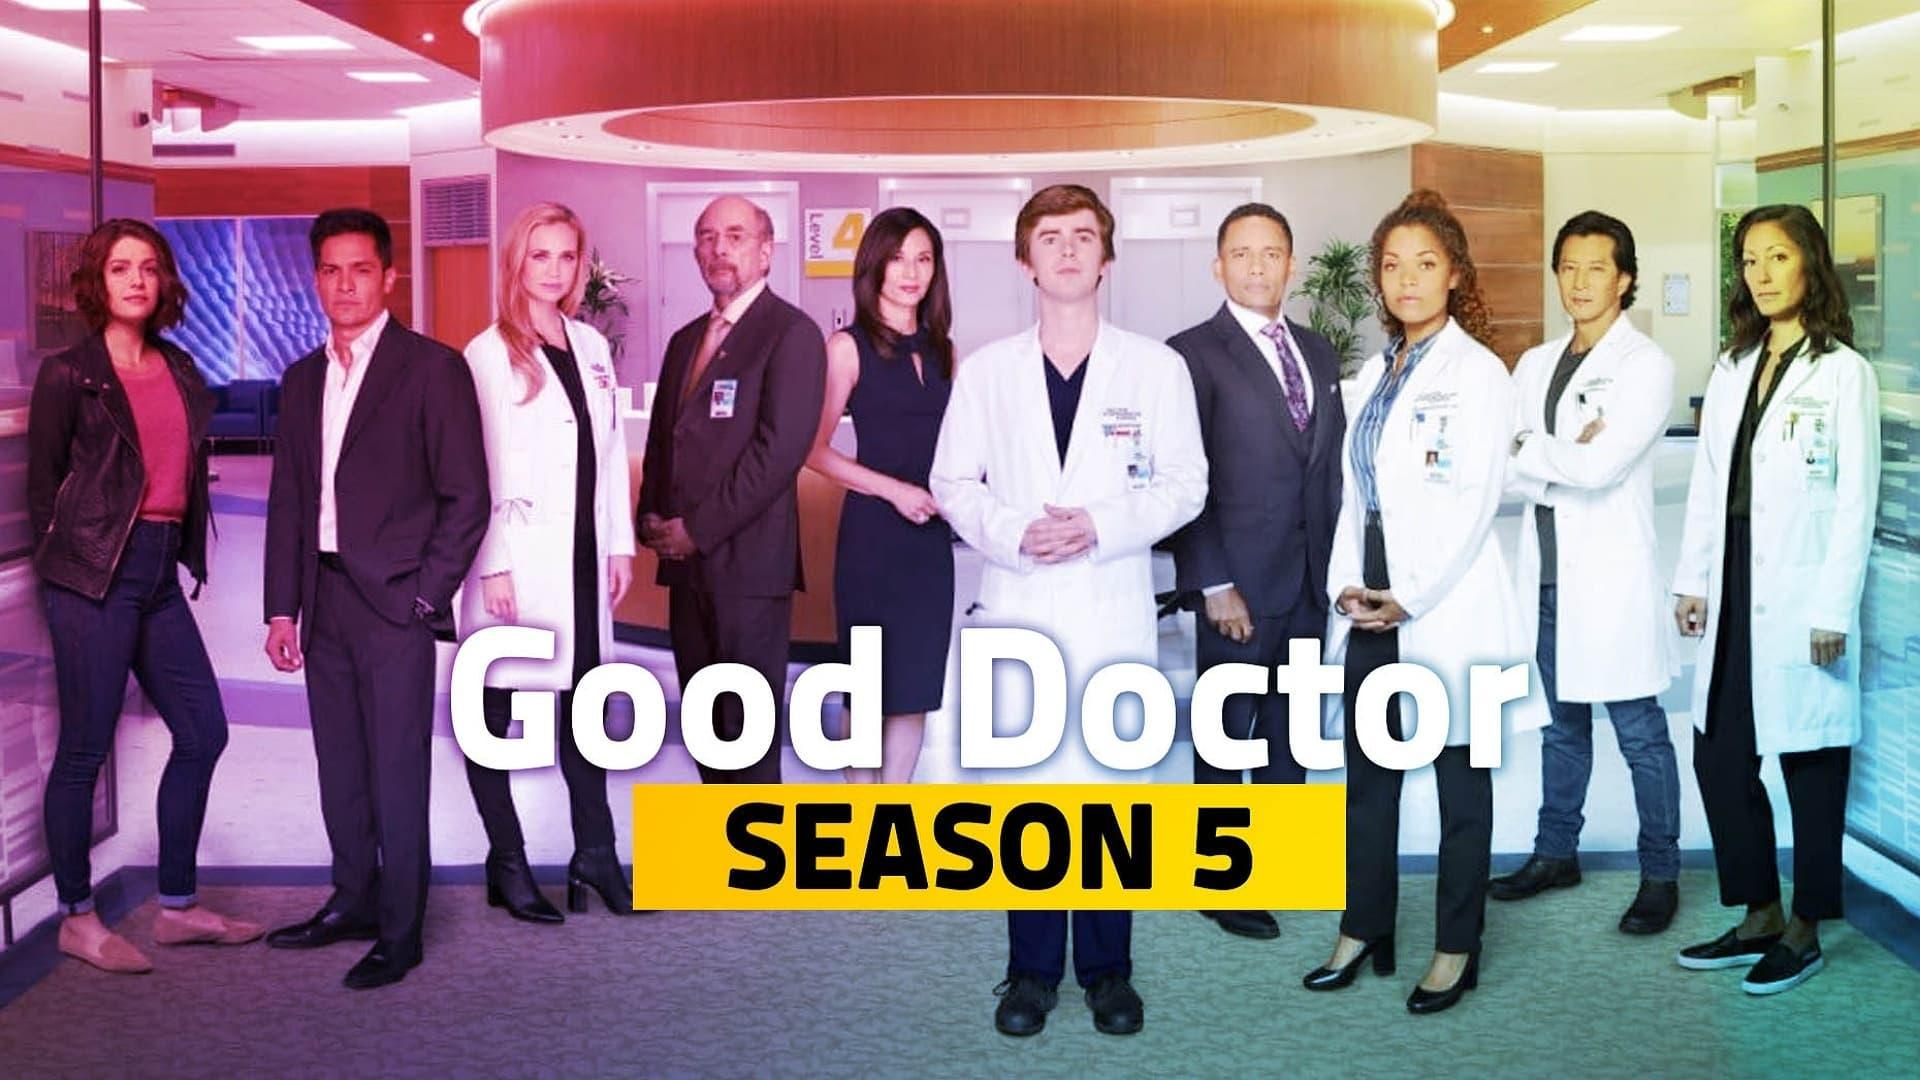 The Good Doctor - Season 5